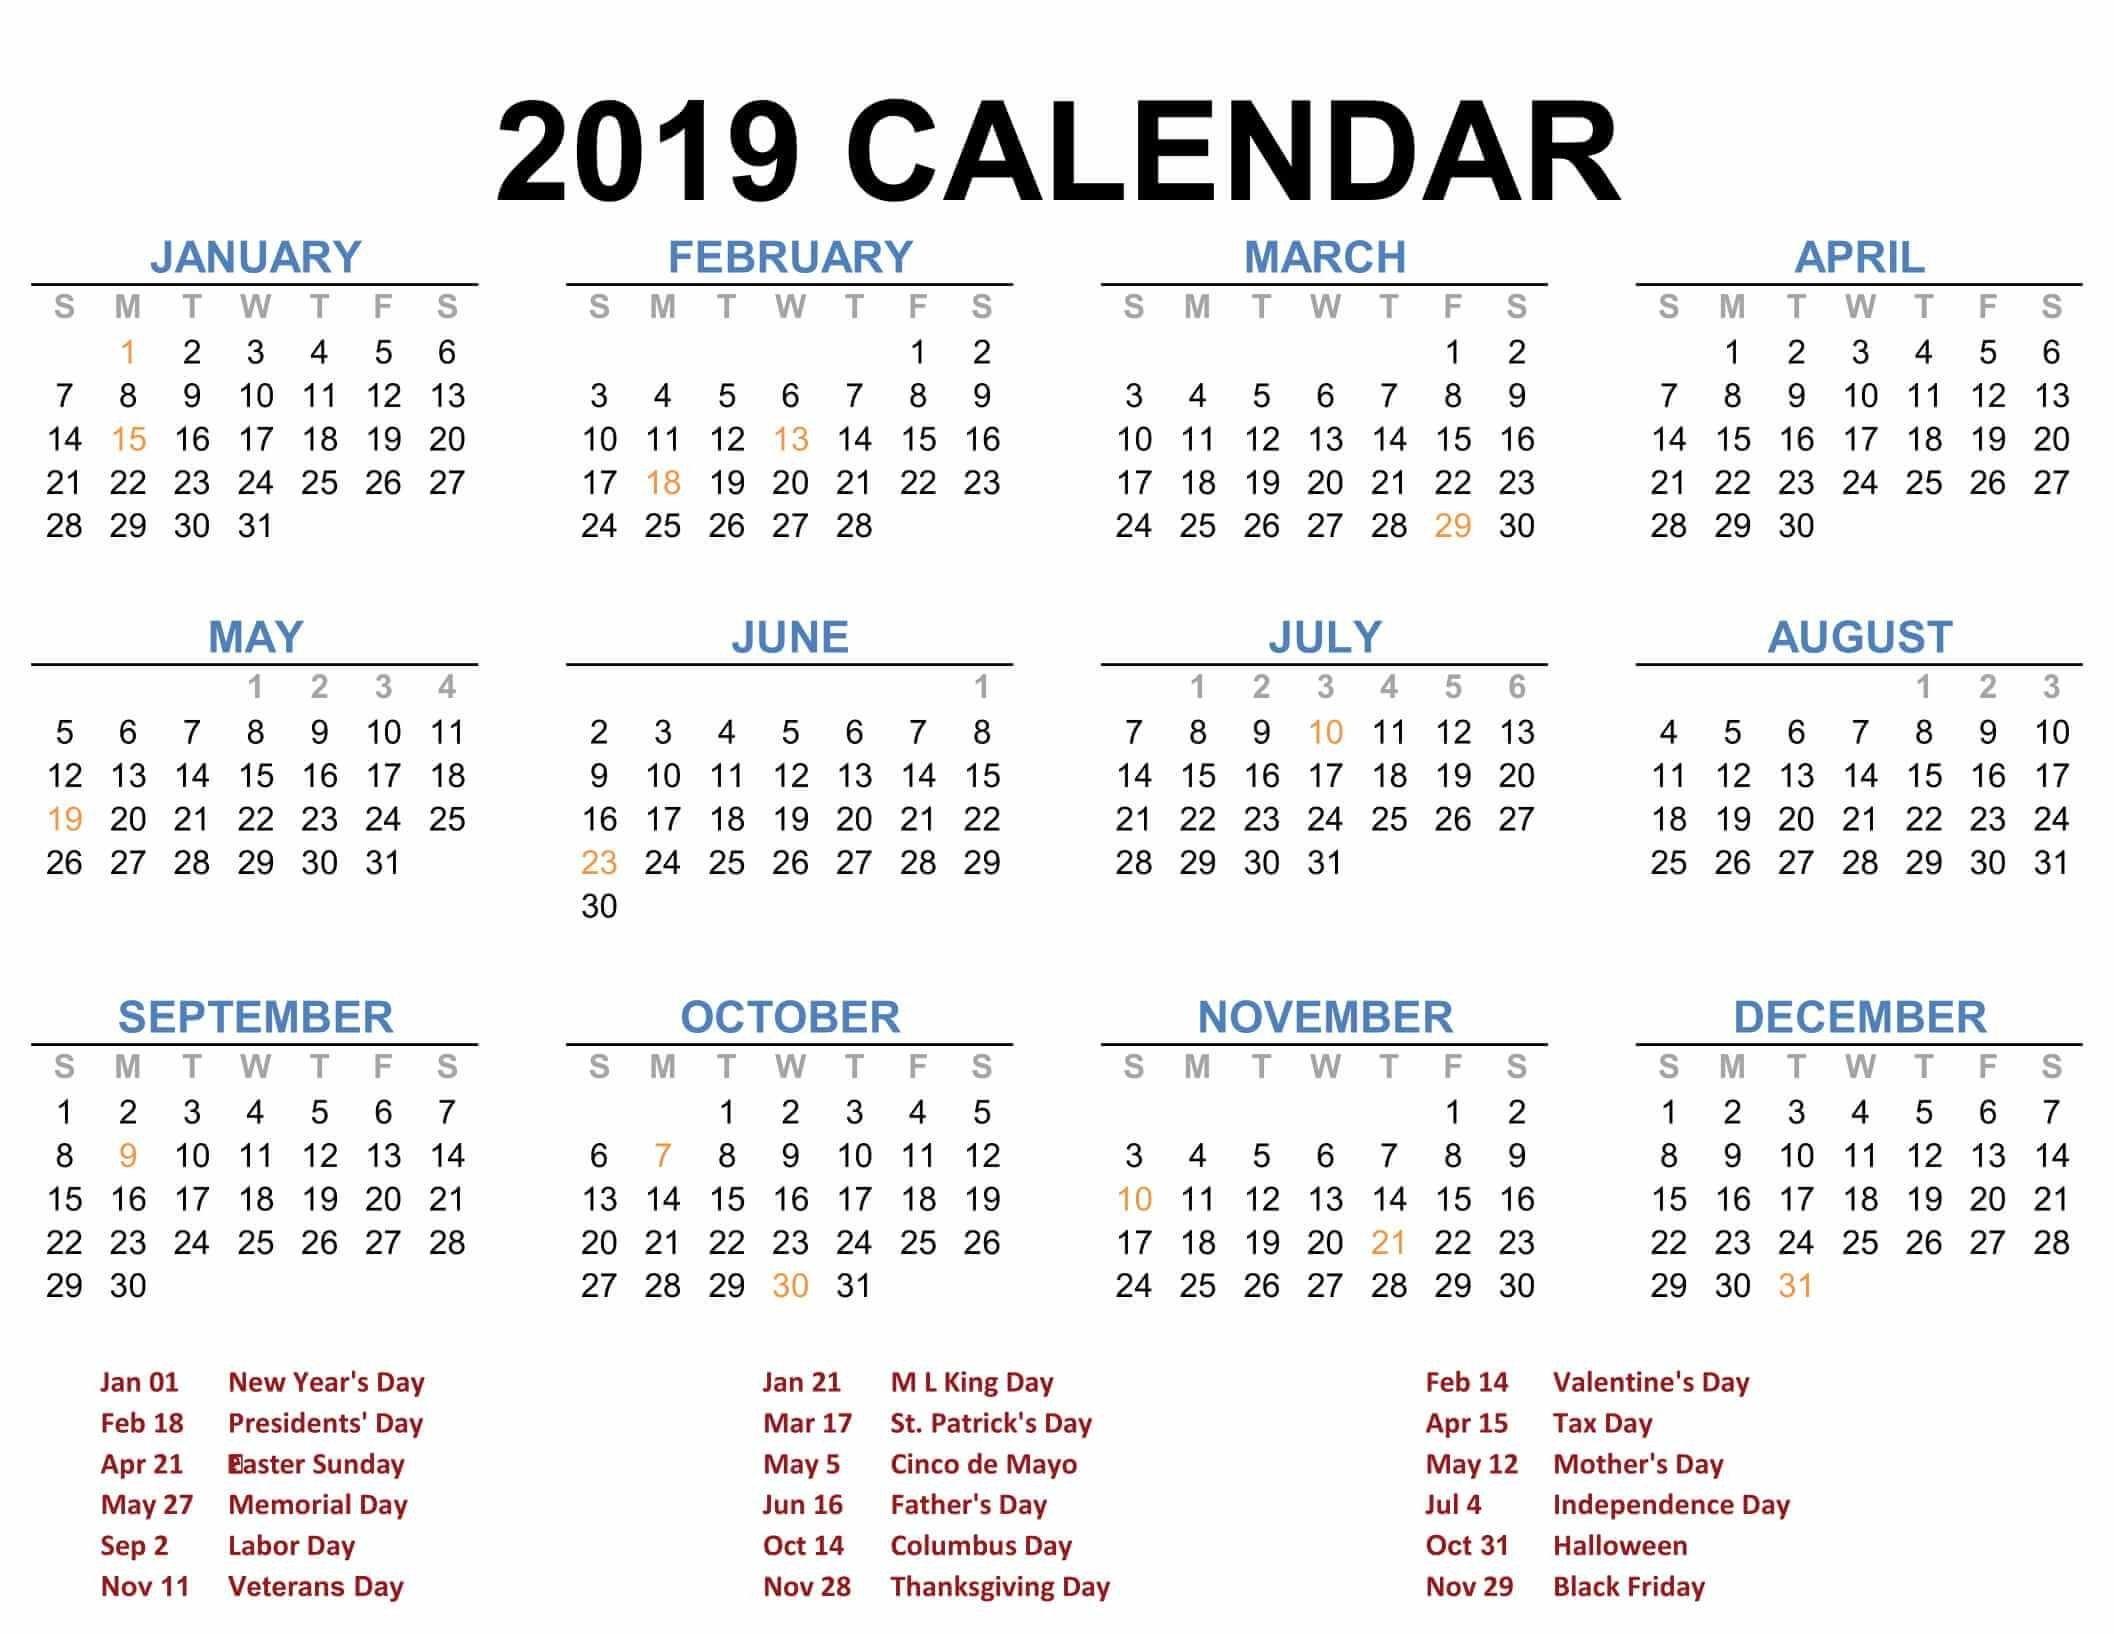 2019 Printable Calendar Templates – Pdf Excel Word – Free Printable Calendar 2019 Annual